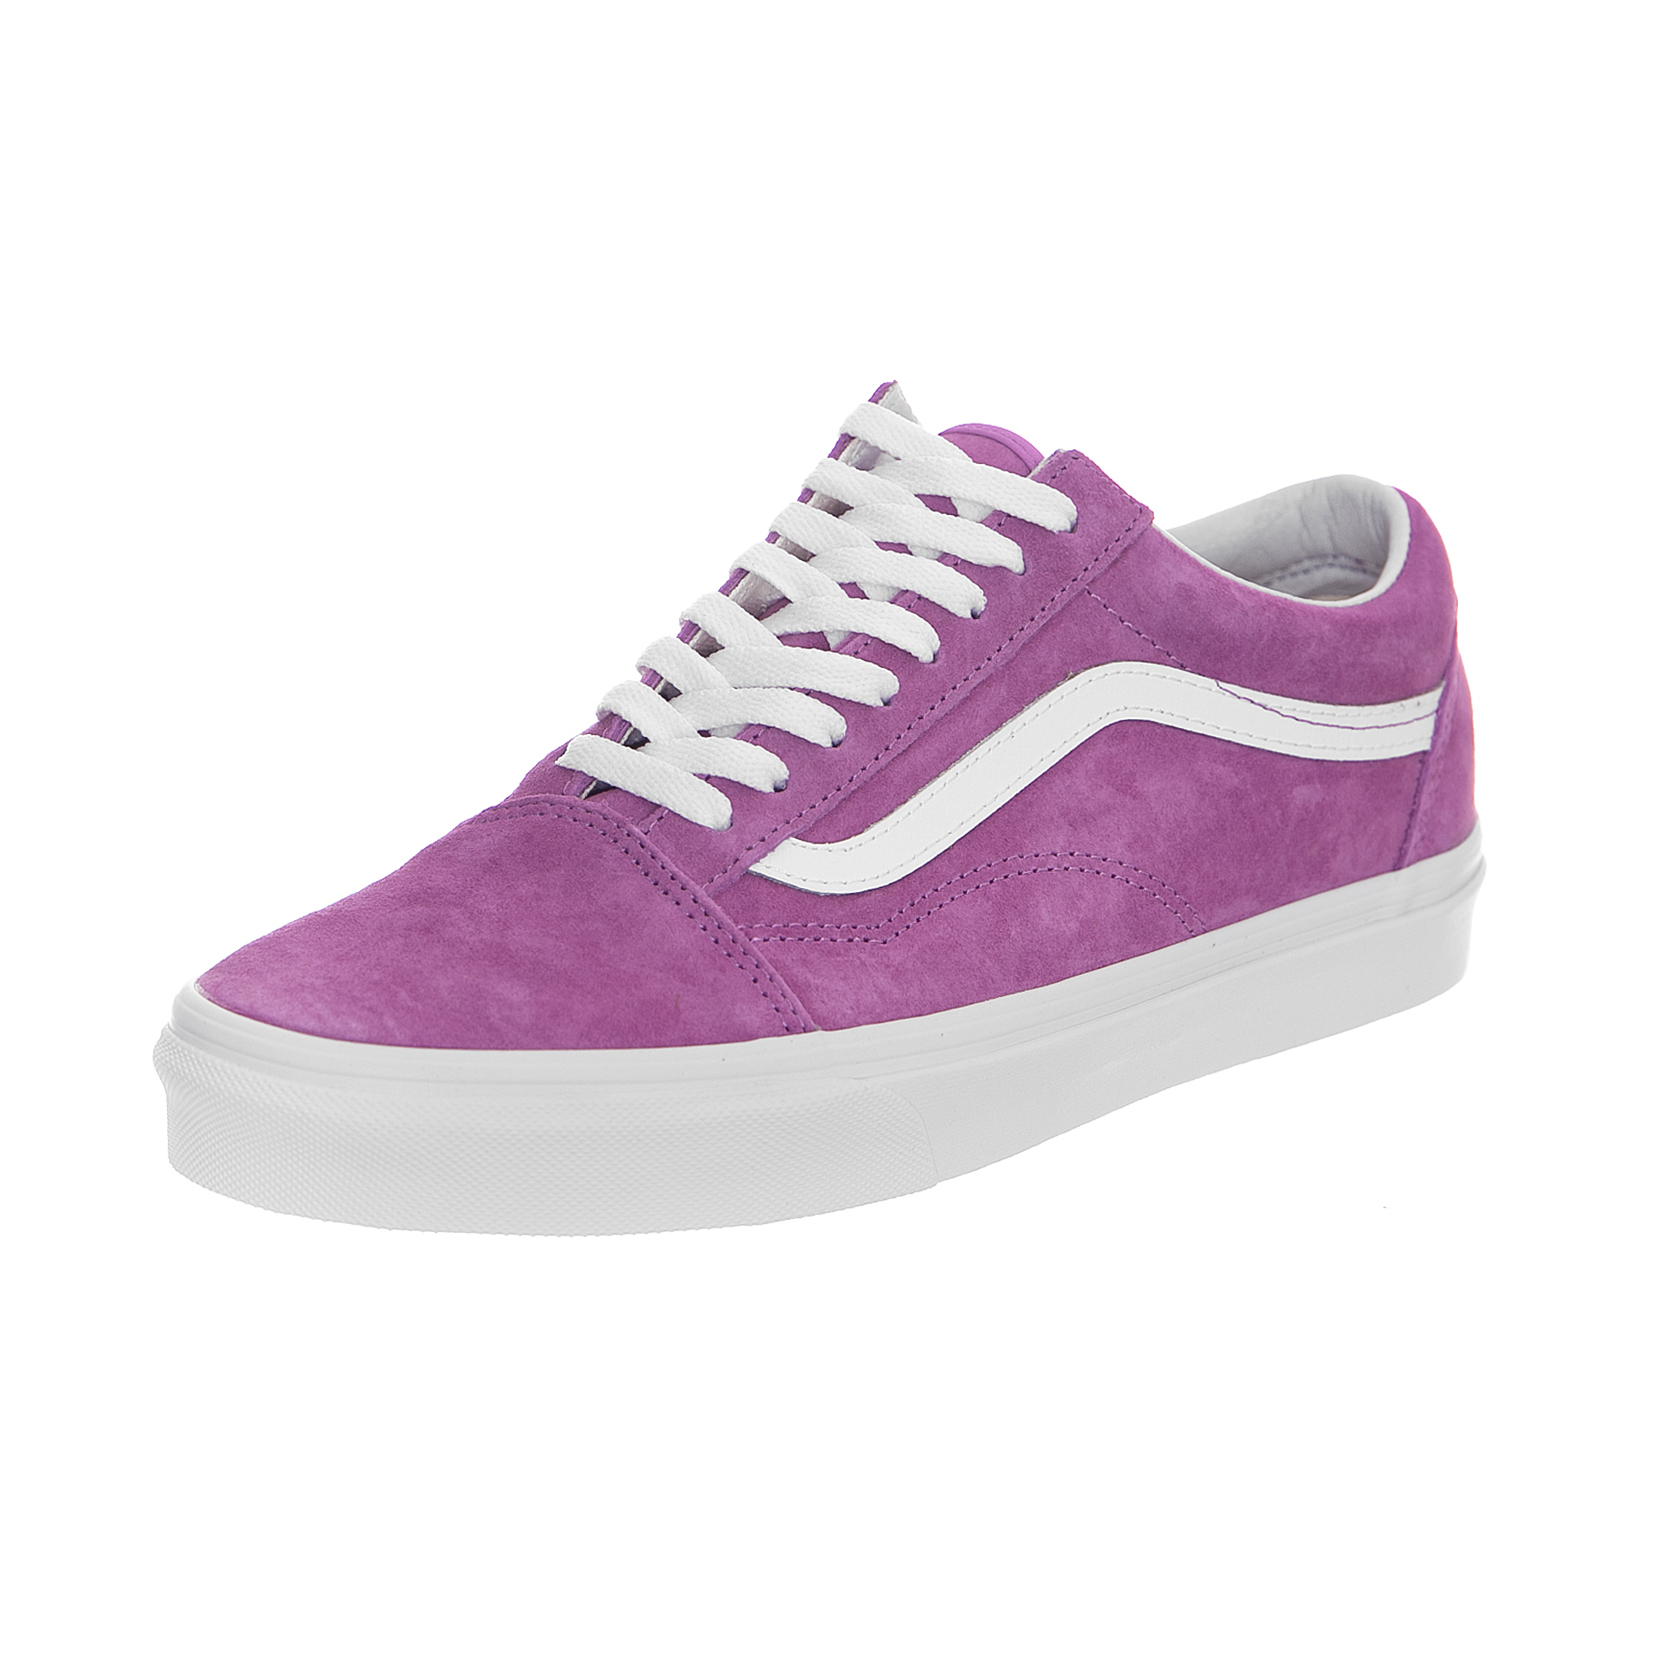 aef6ed6c57436e Vans Sneakers Ua Old Skool (Pig Suede) Violet Ttue White Violet